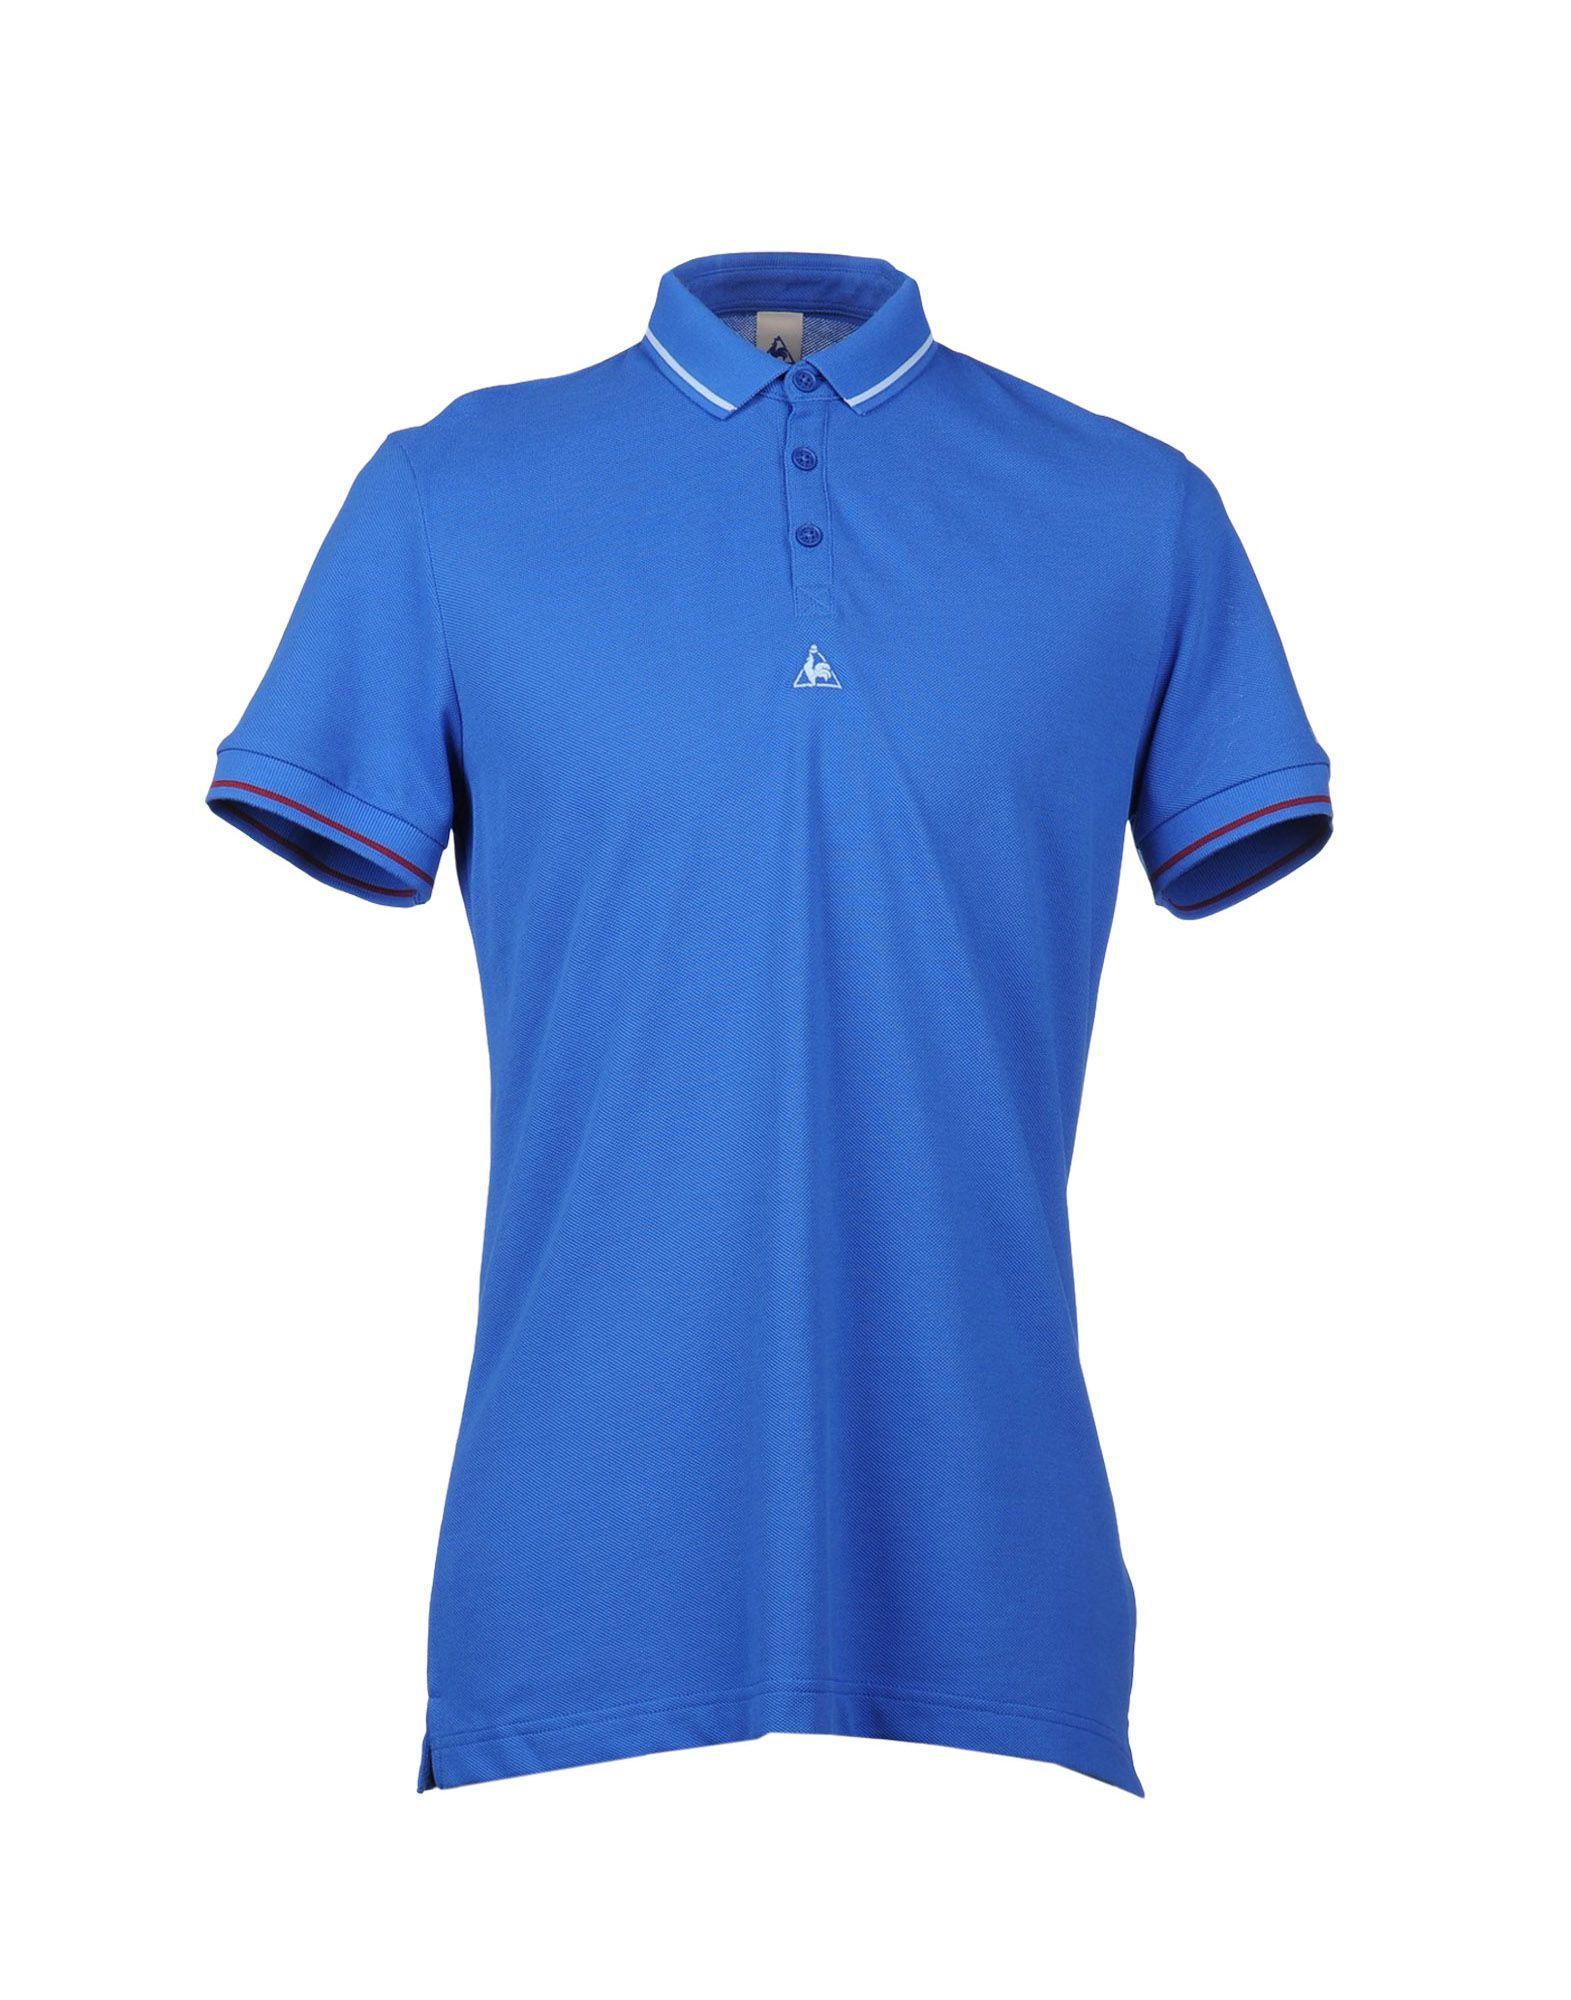 le coq sportif shirt - photo #21